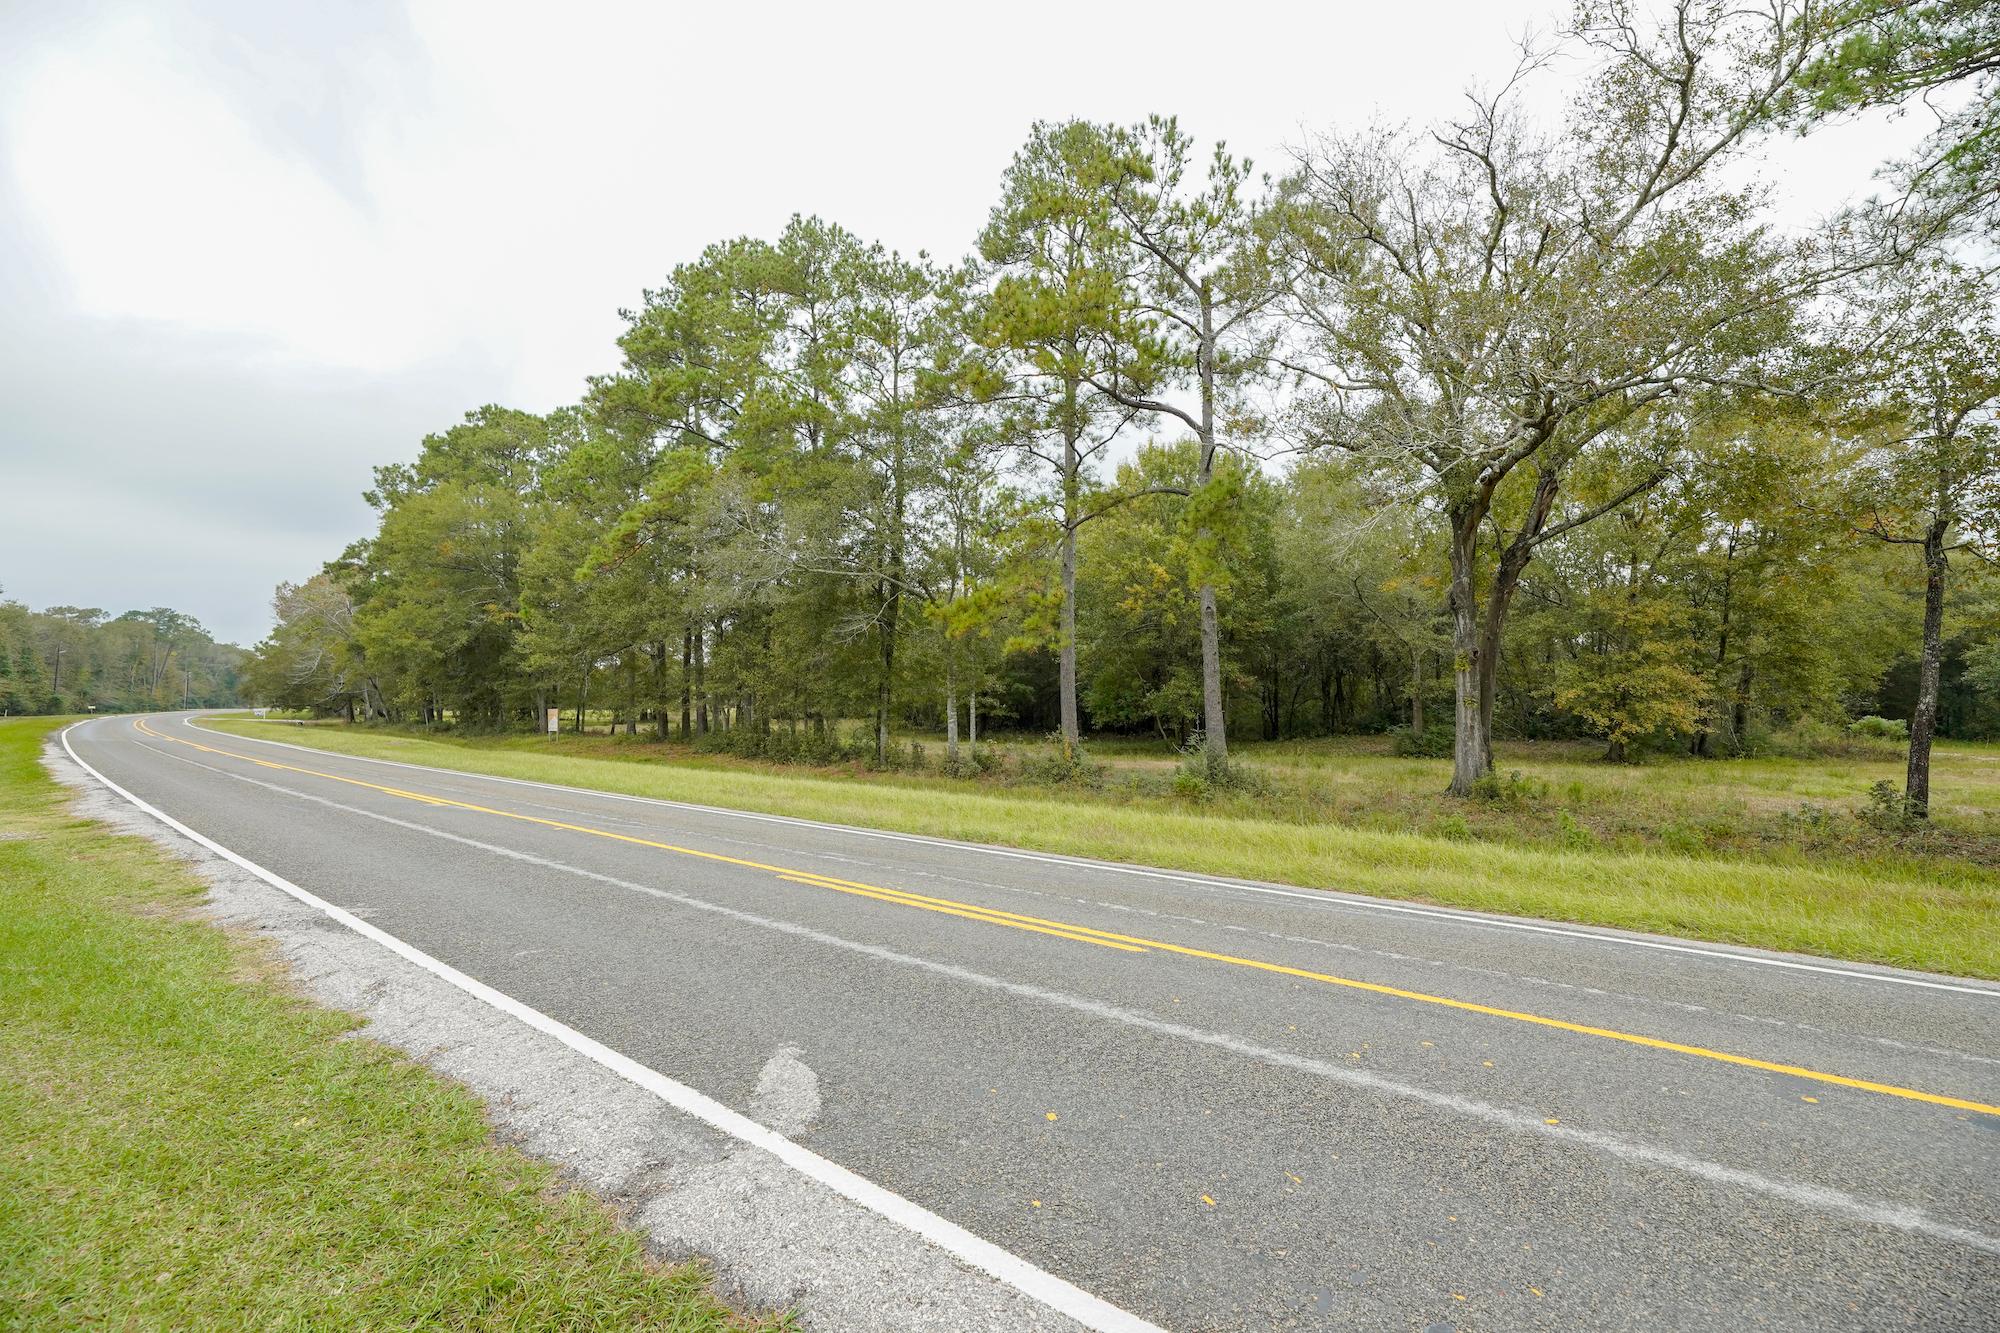 Jefferson County Development Land - Image 30 of 36